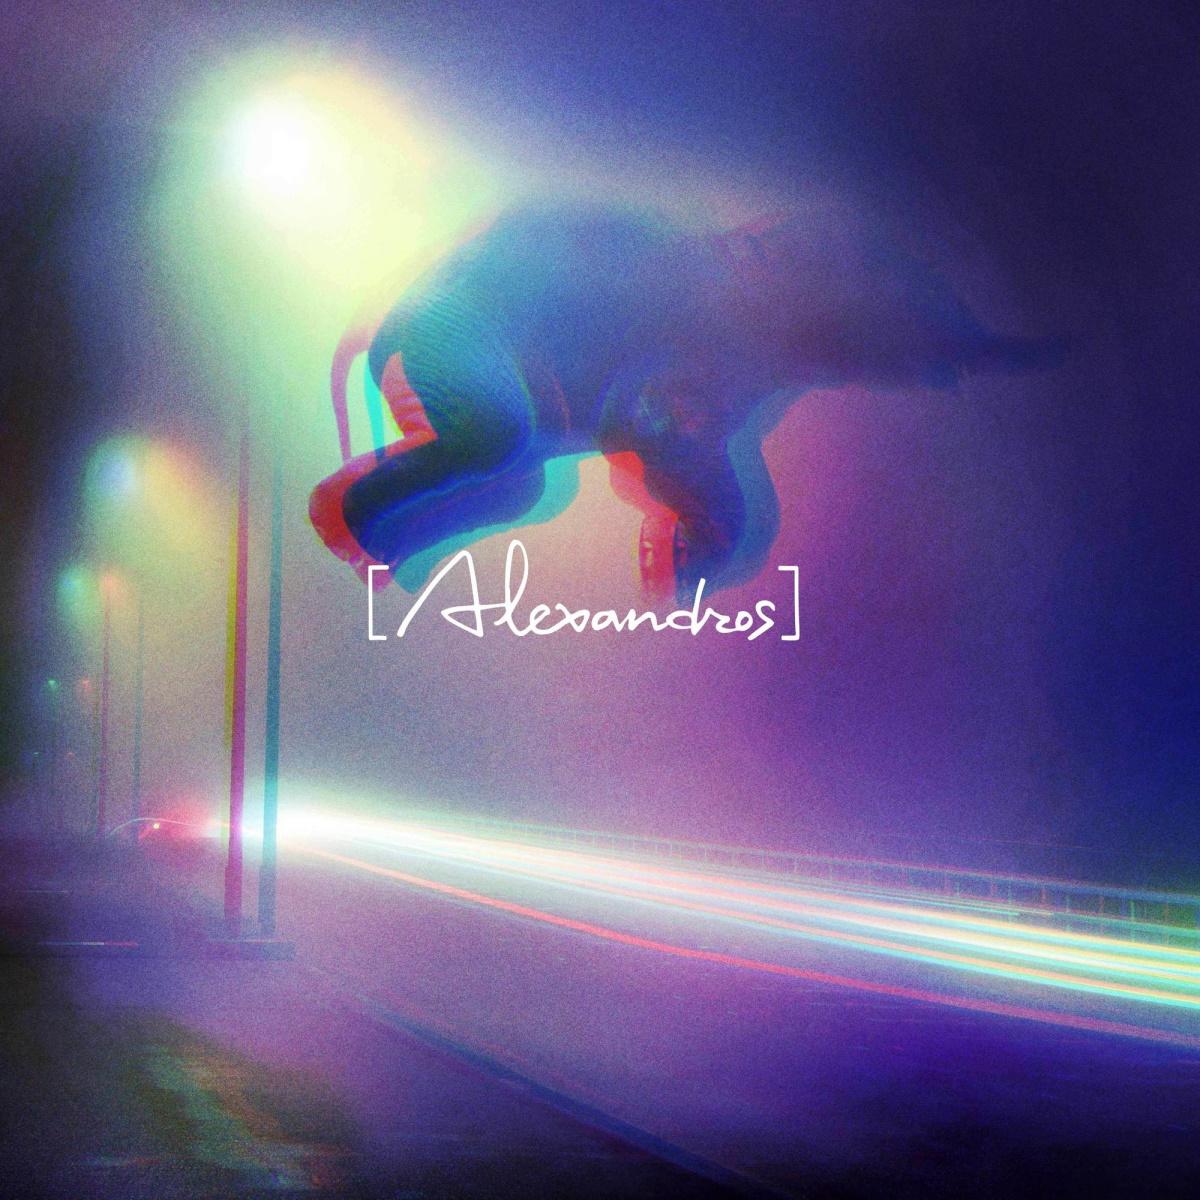 『[Alexandros] - 閃光 (English ver.)』収録の『閃光』ジャケット